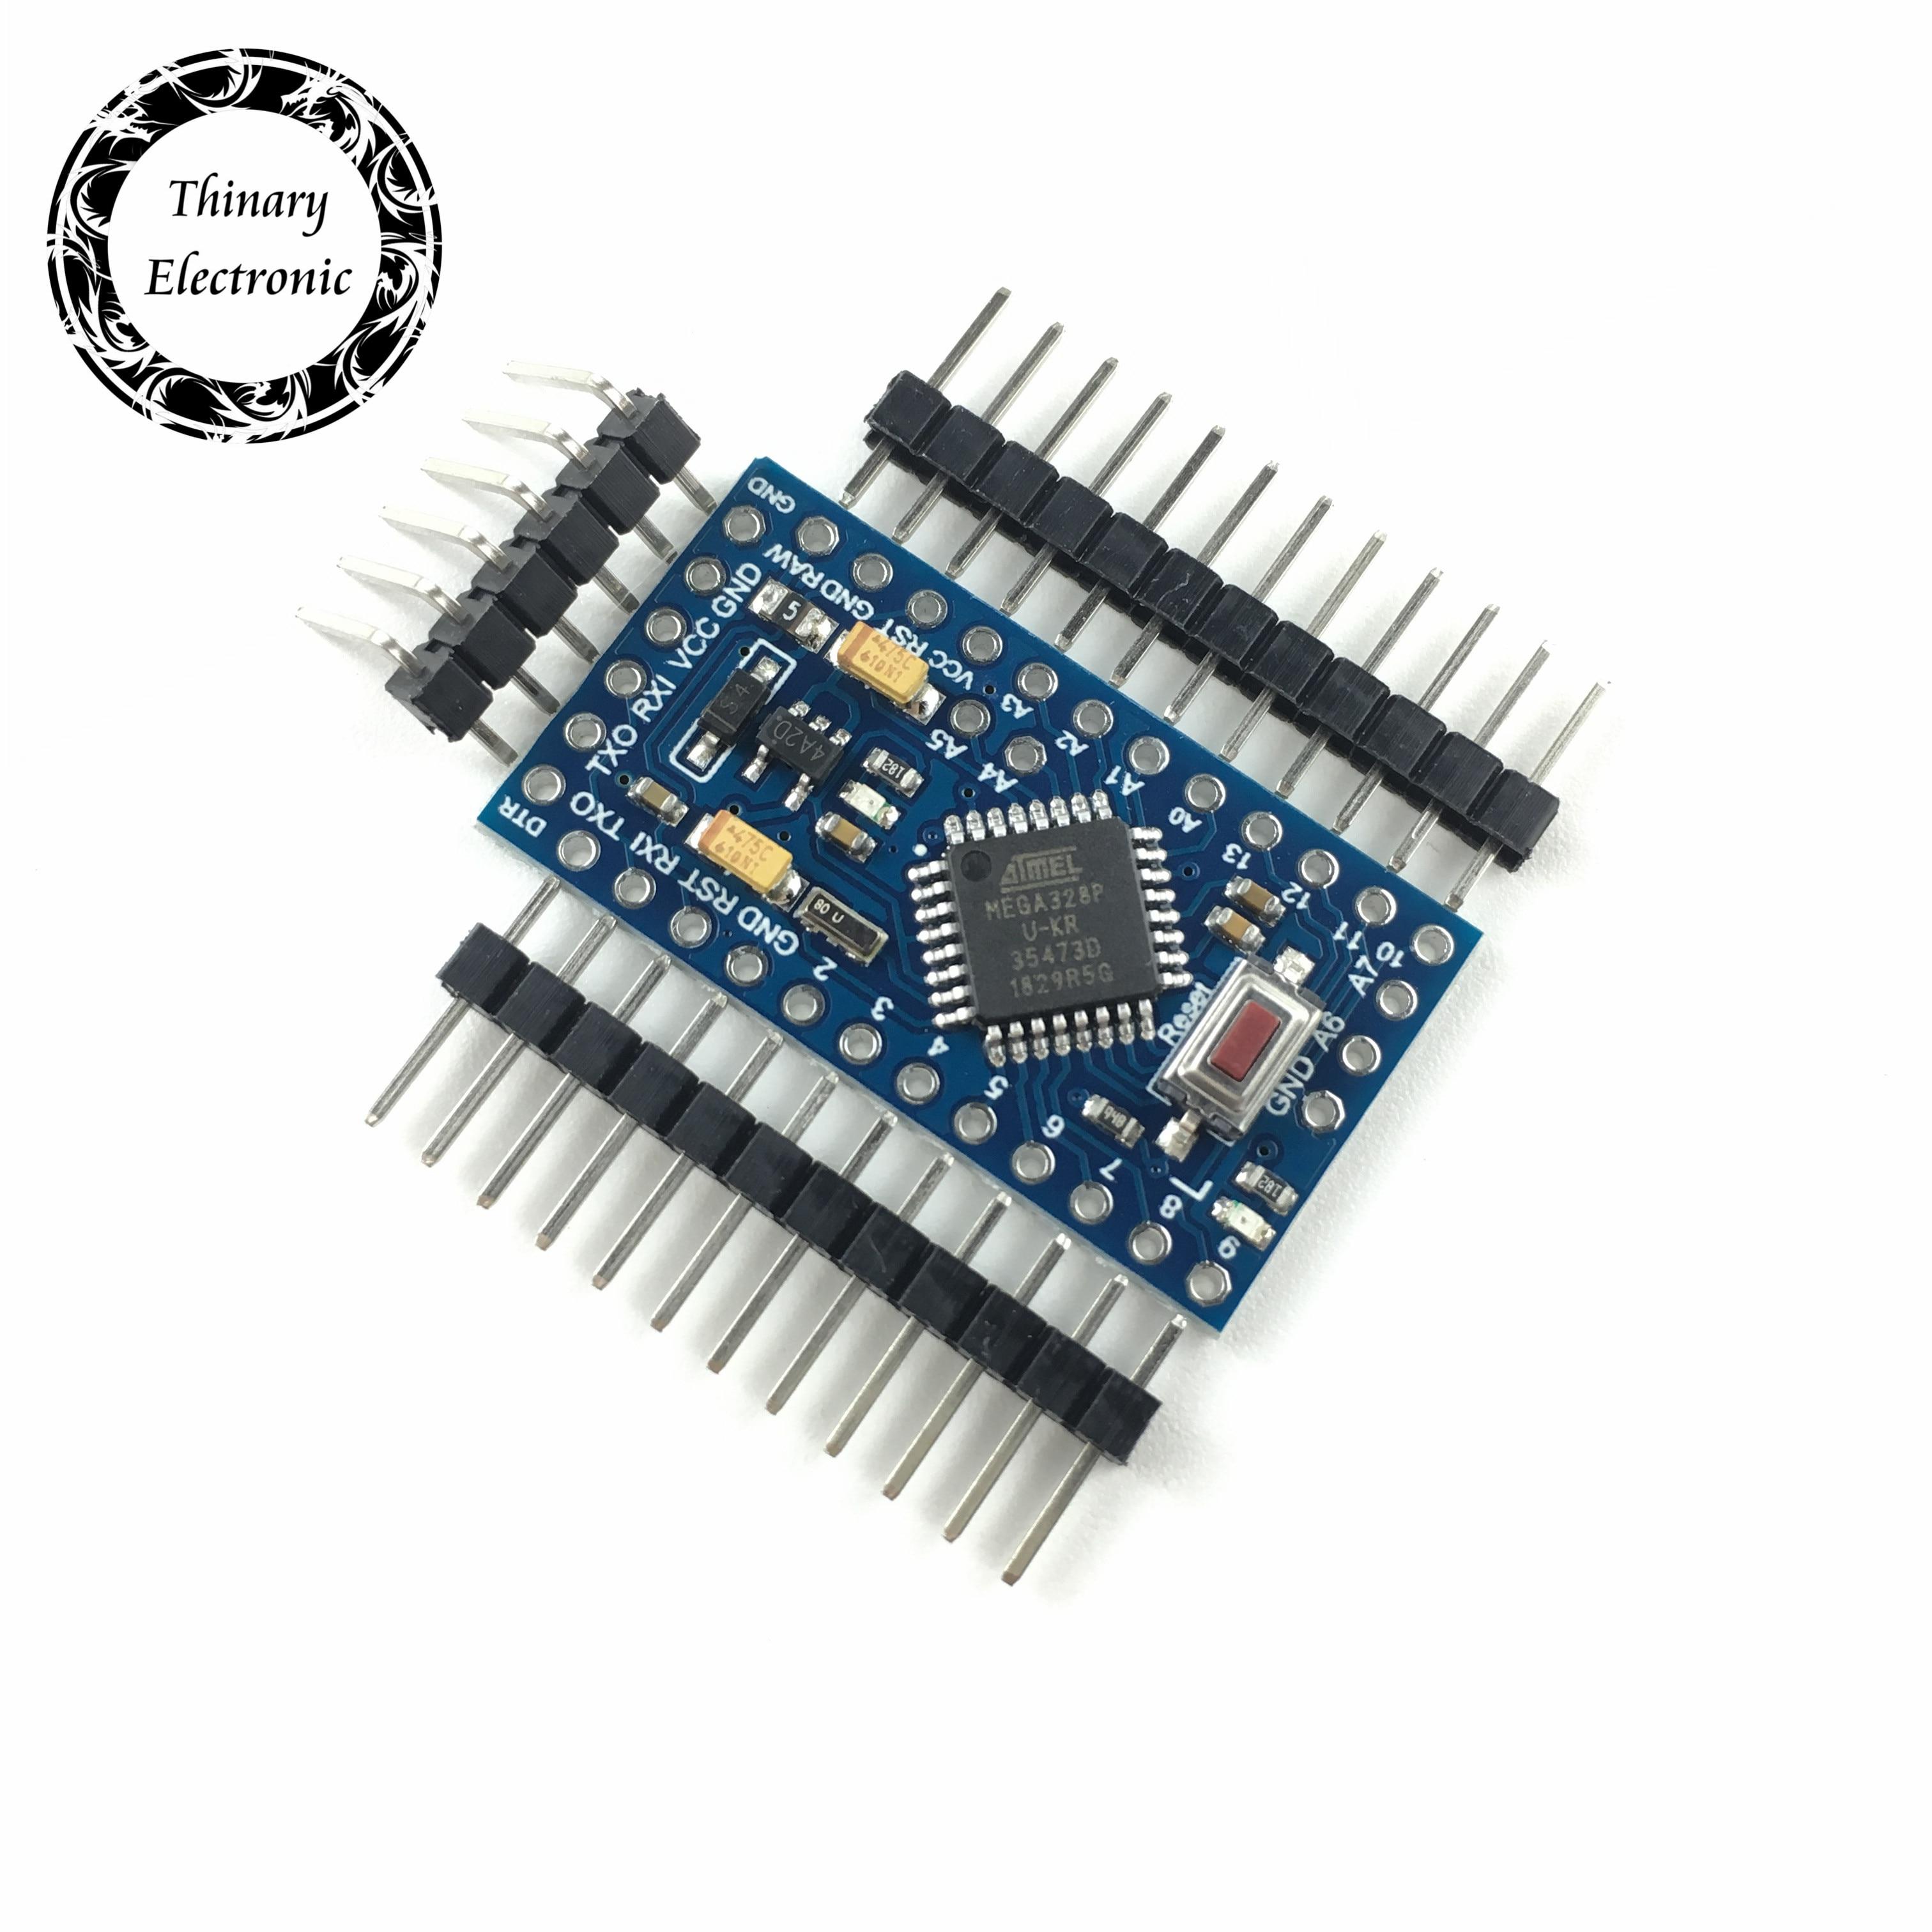 Free shipping 20pcs/lot Pro Mini 328 Mini ATMEGA328 ATMEGA328P AU 5V/16MHz for Arduino Pro mini Atmega328P-in Integrated Circuits from Electronic Components & Supplies    1